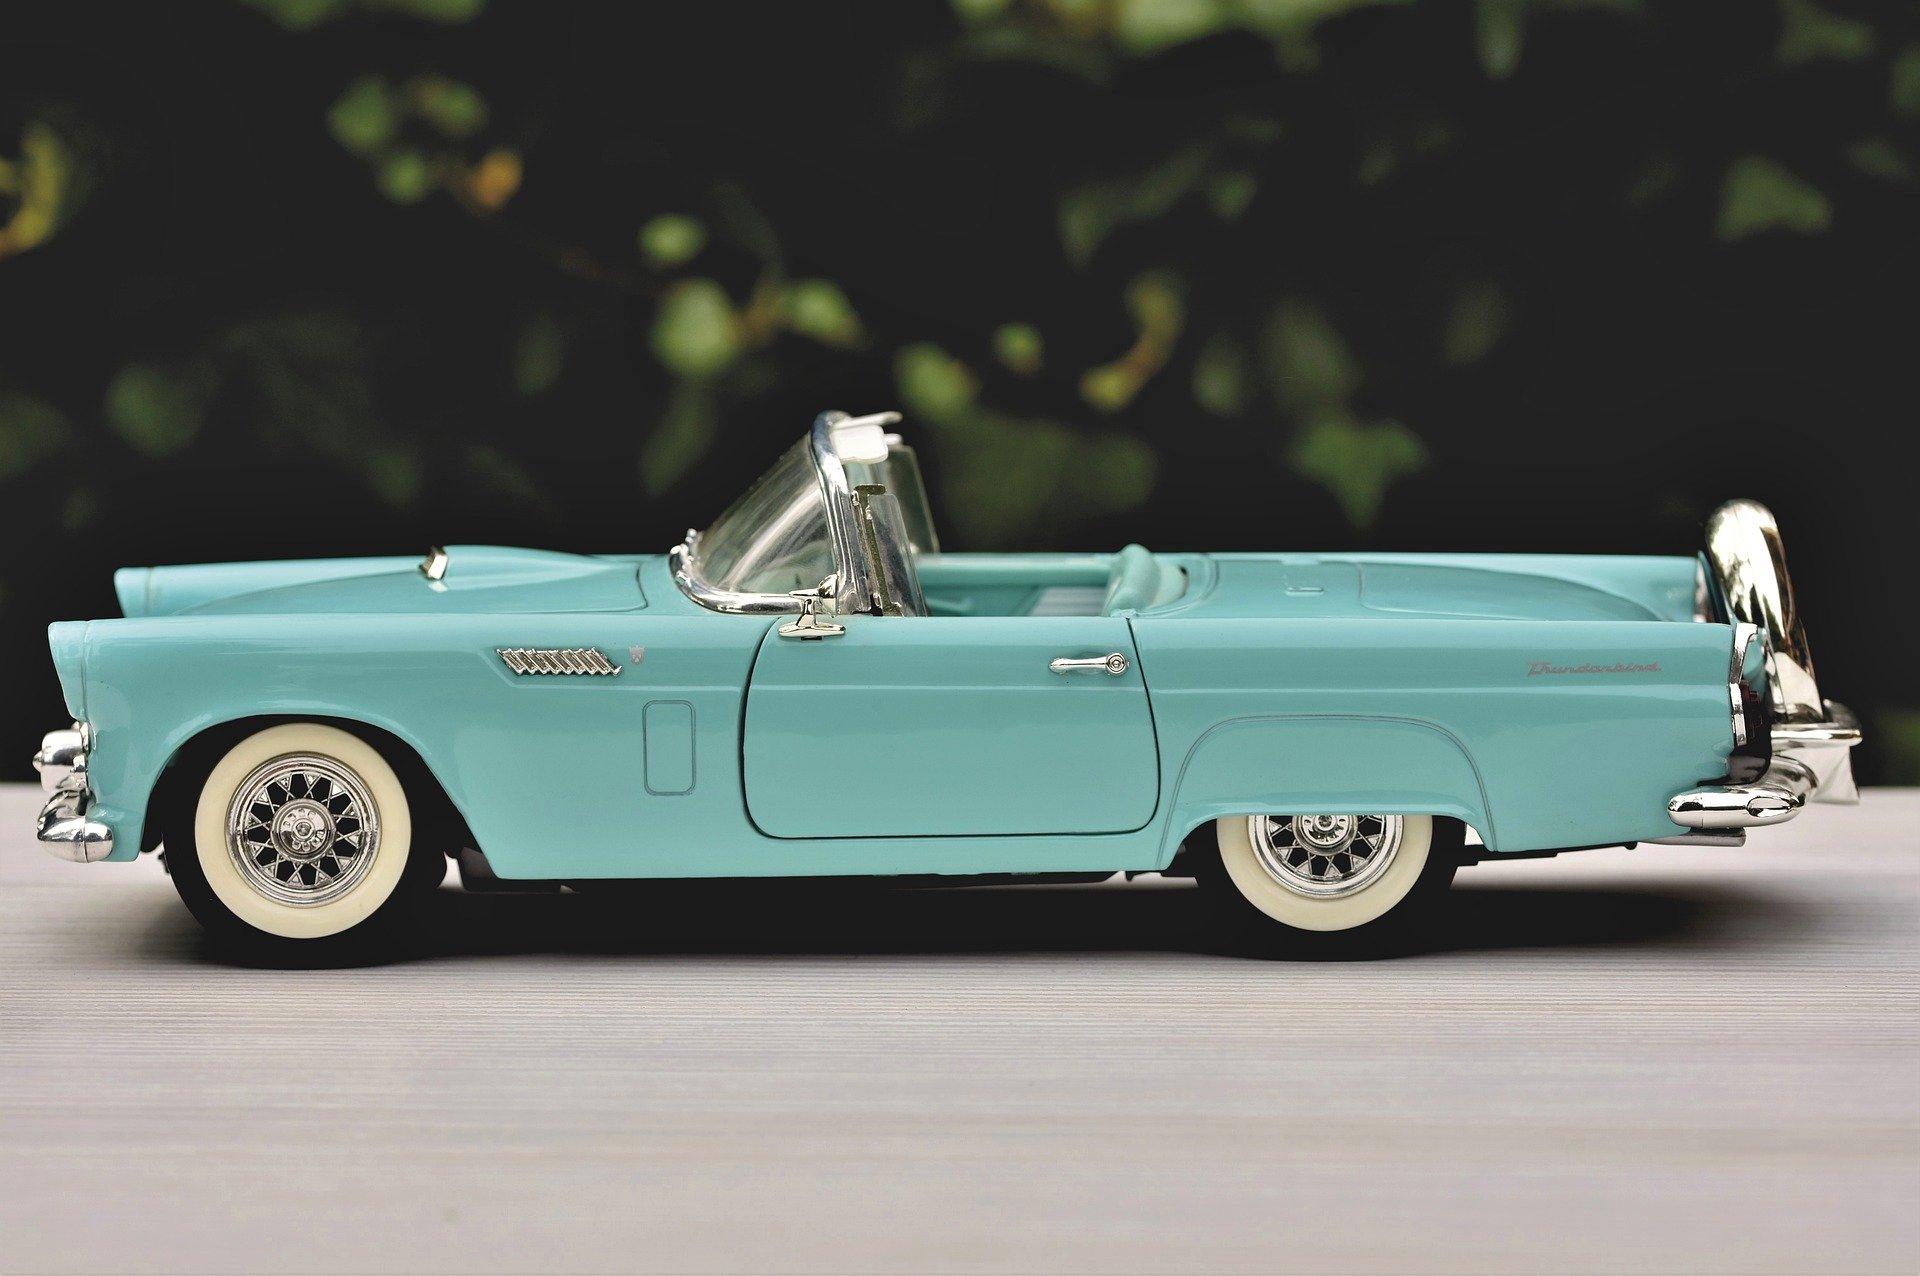 Ford Tanderbird proizvodio se od 1955. kao sportski dvosed